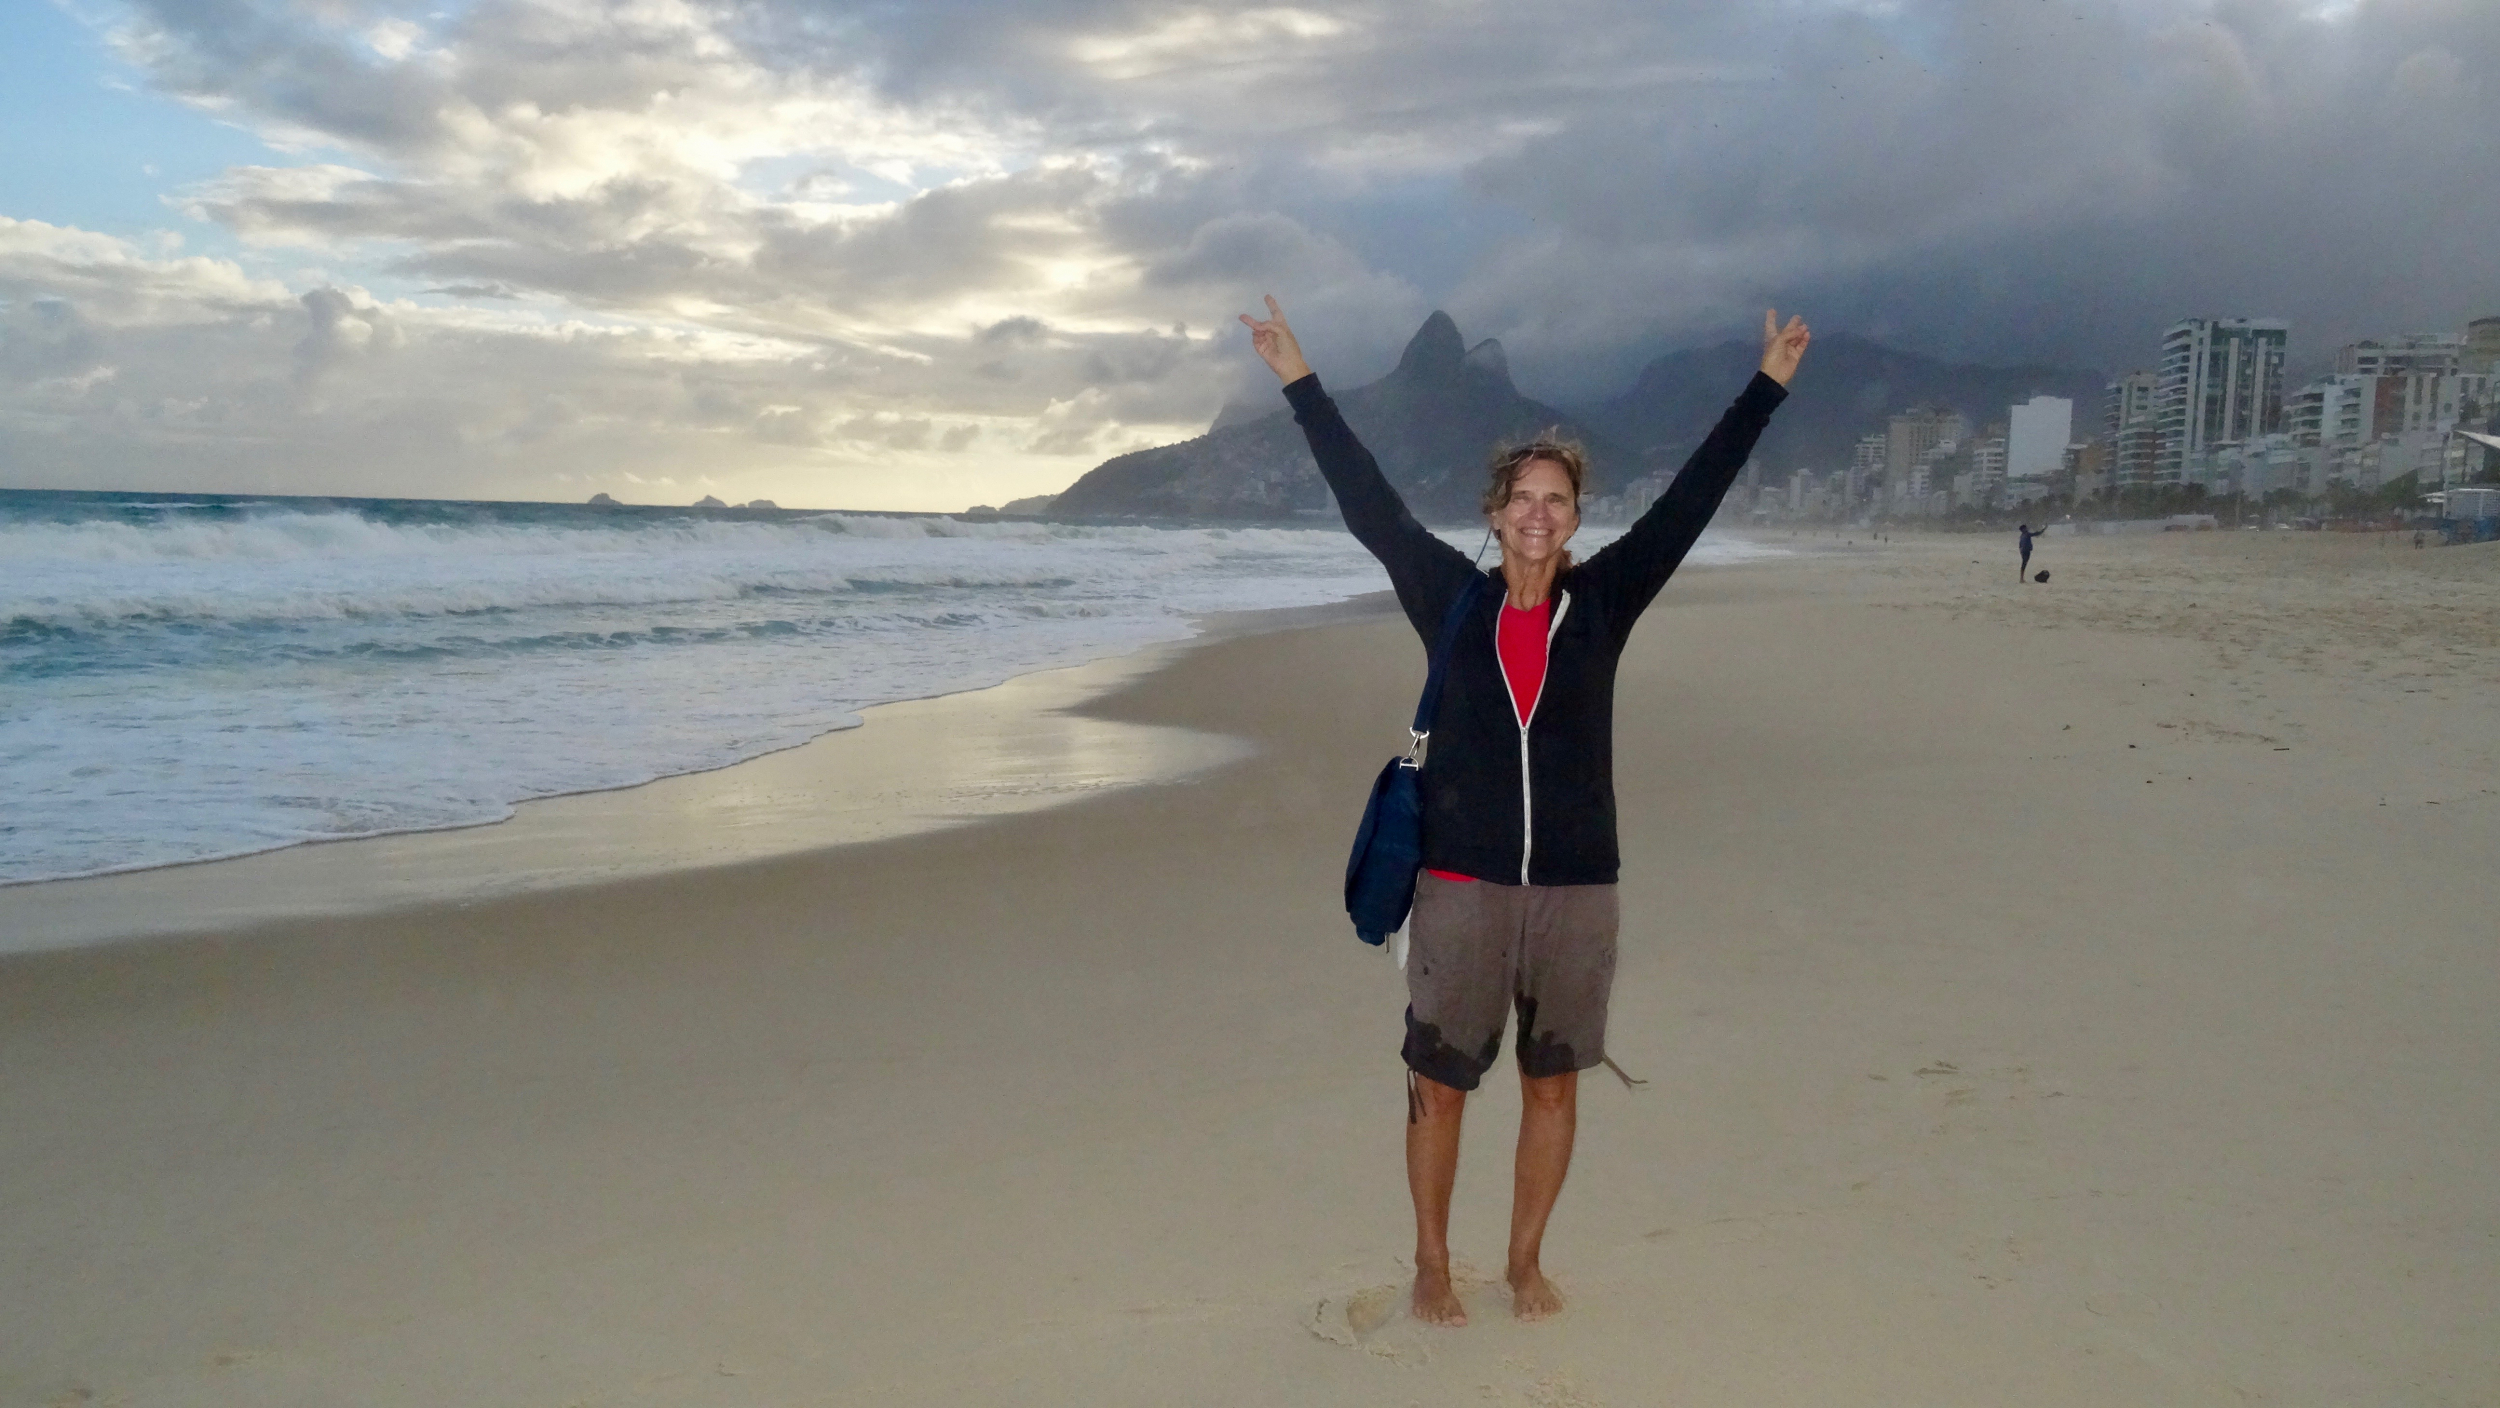 14. Cindy on Ipanema beach